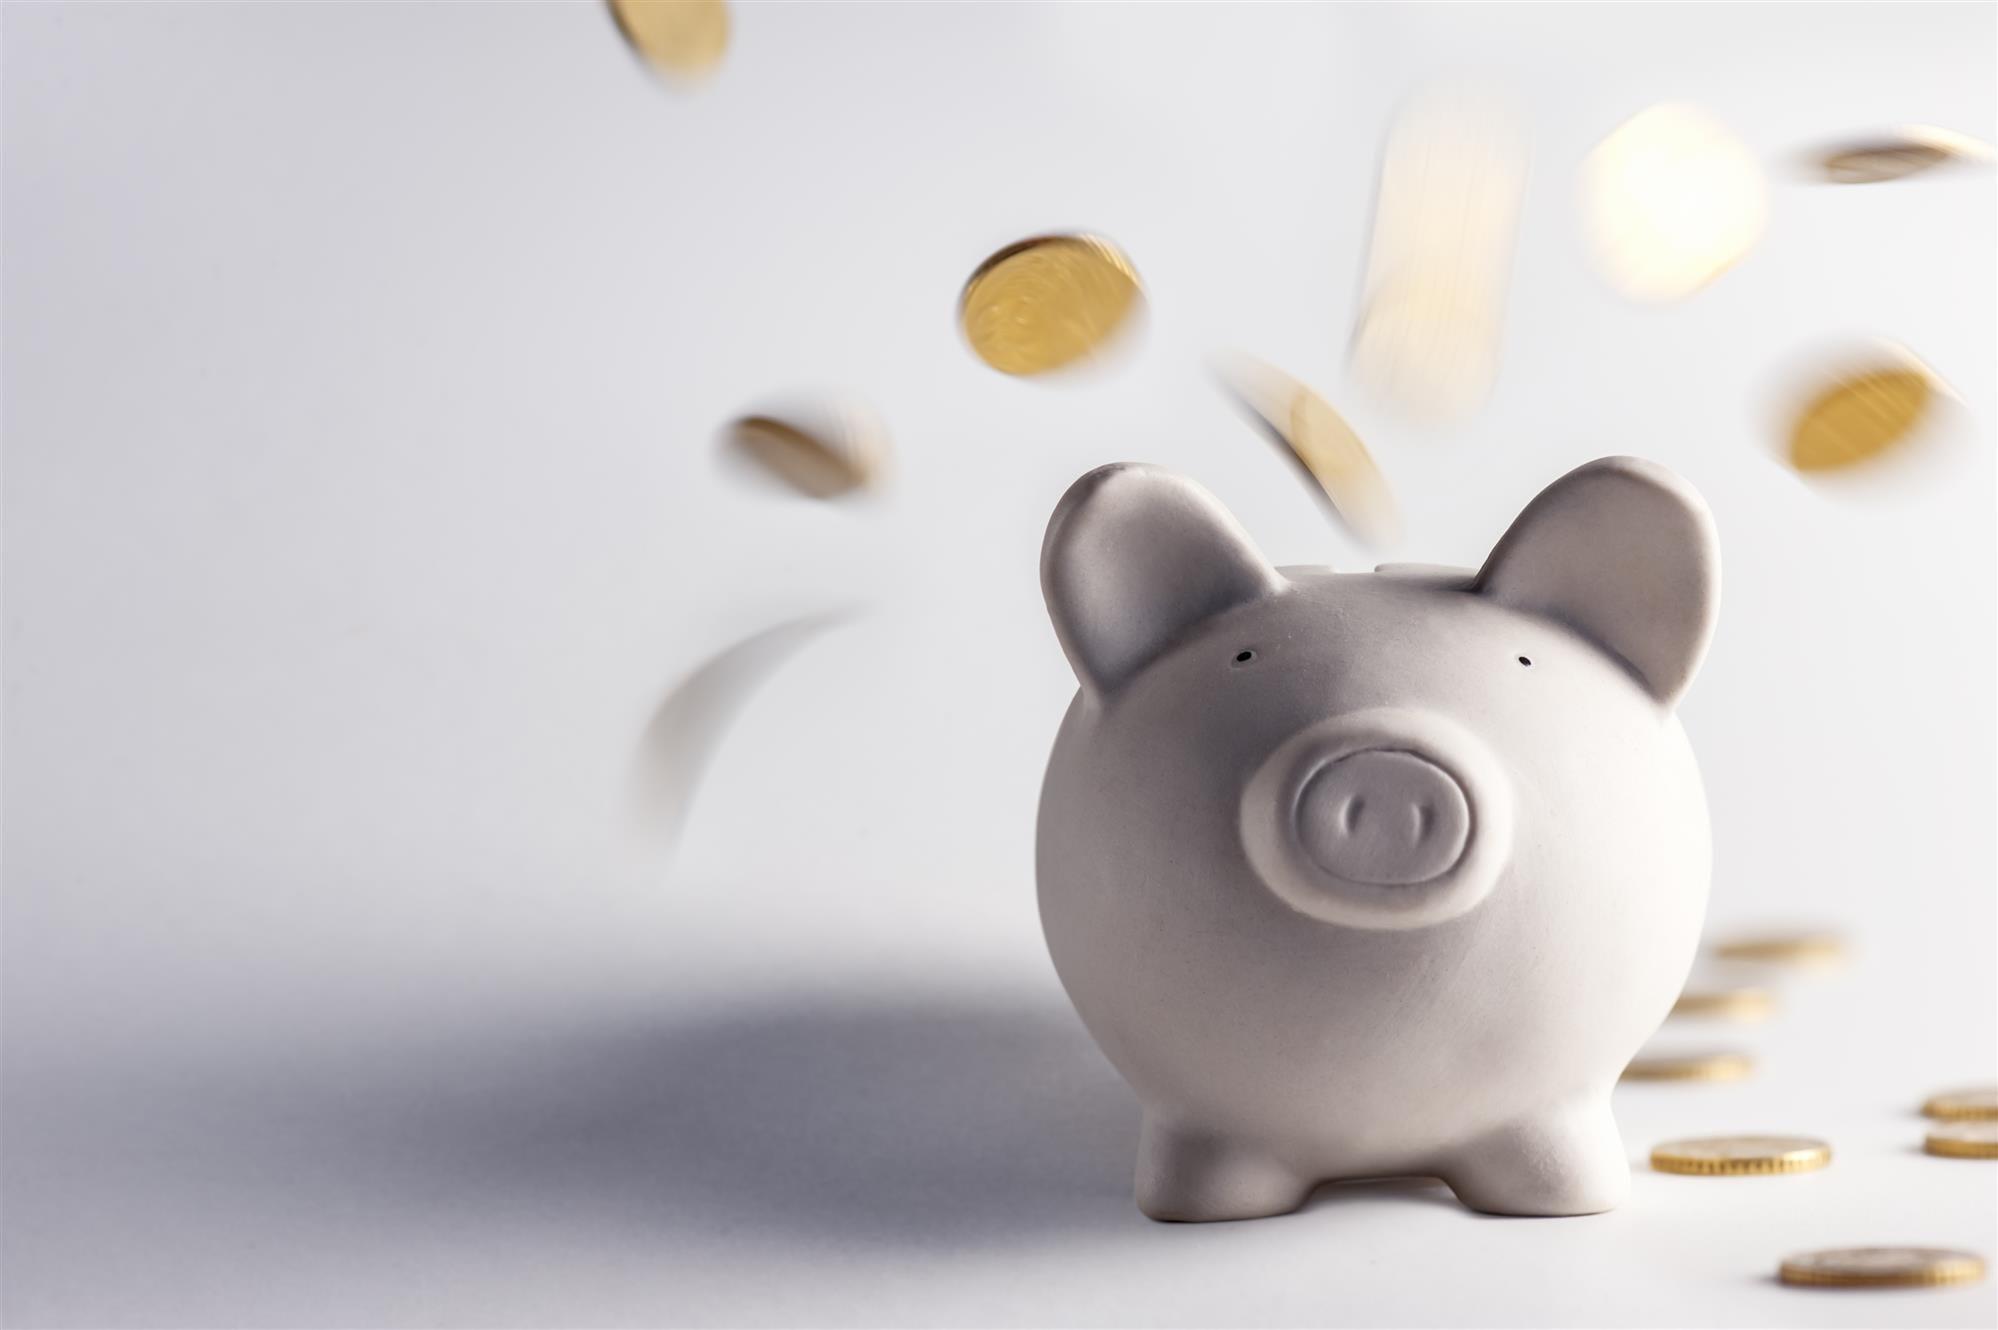 Financial Management Fundamentals & Alternative Career Options After Retirement